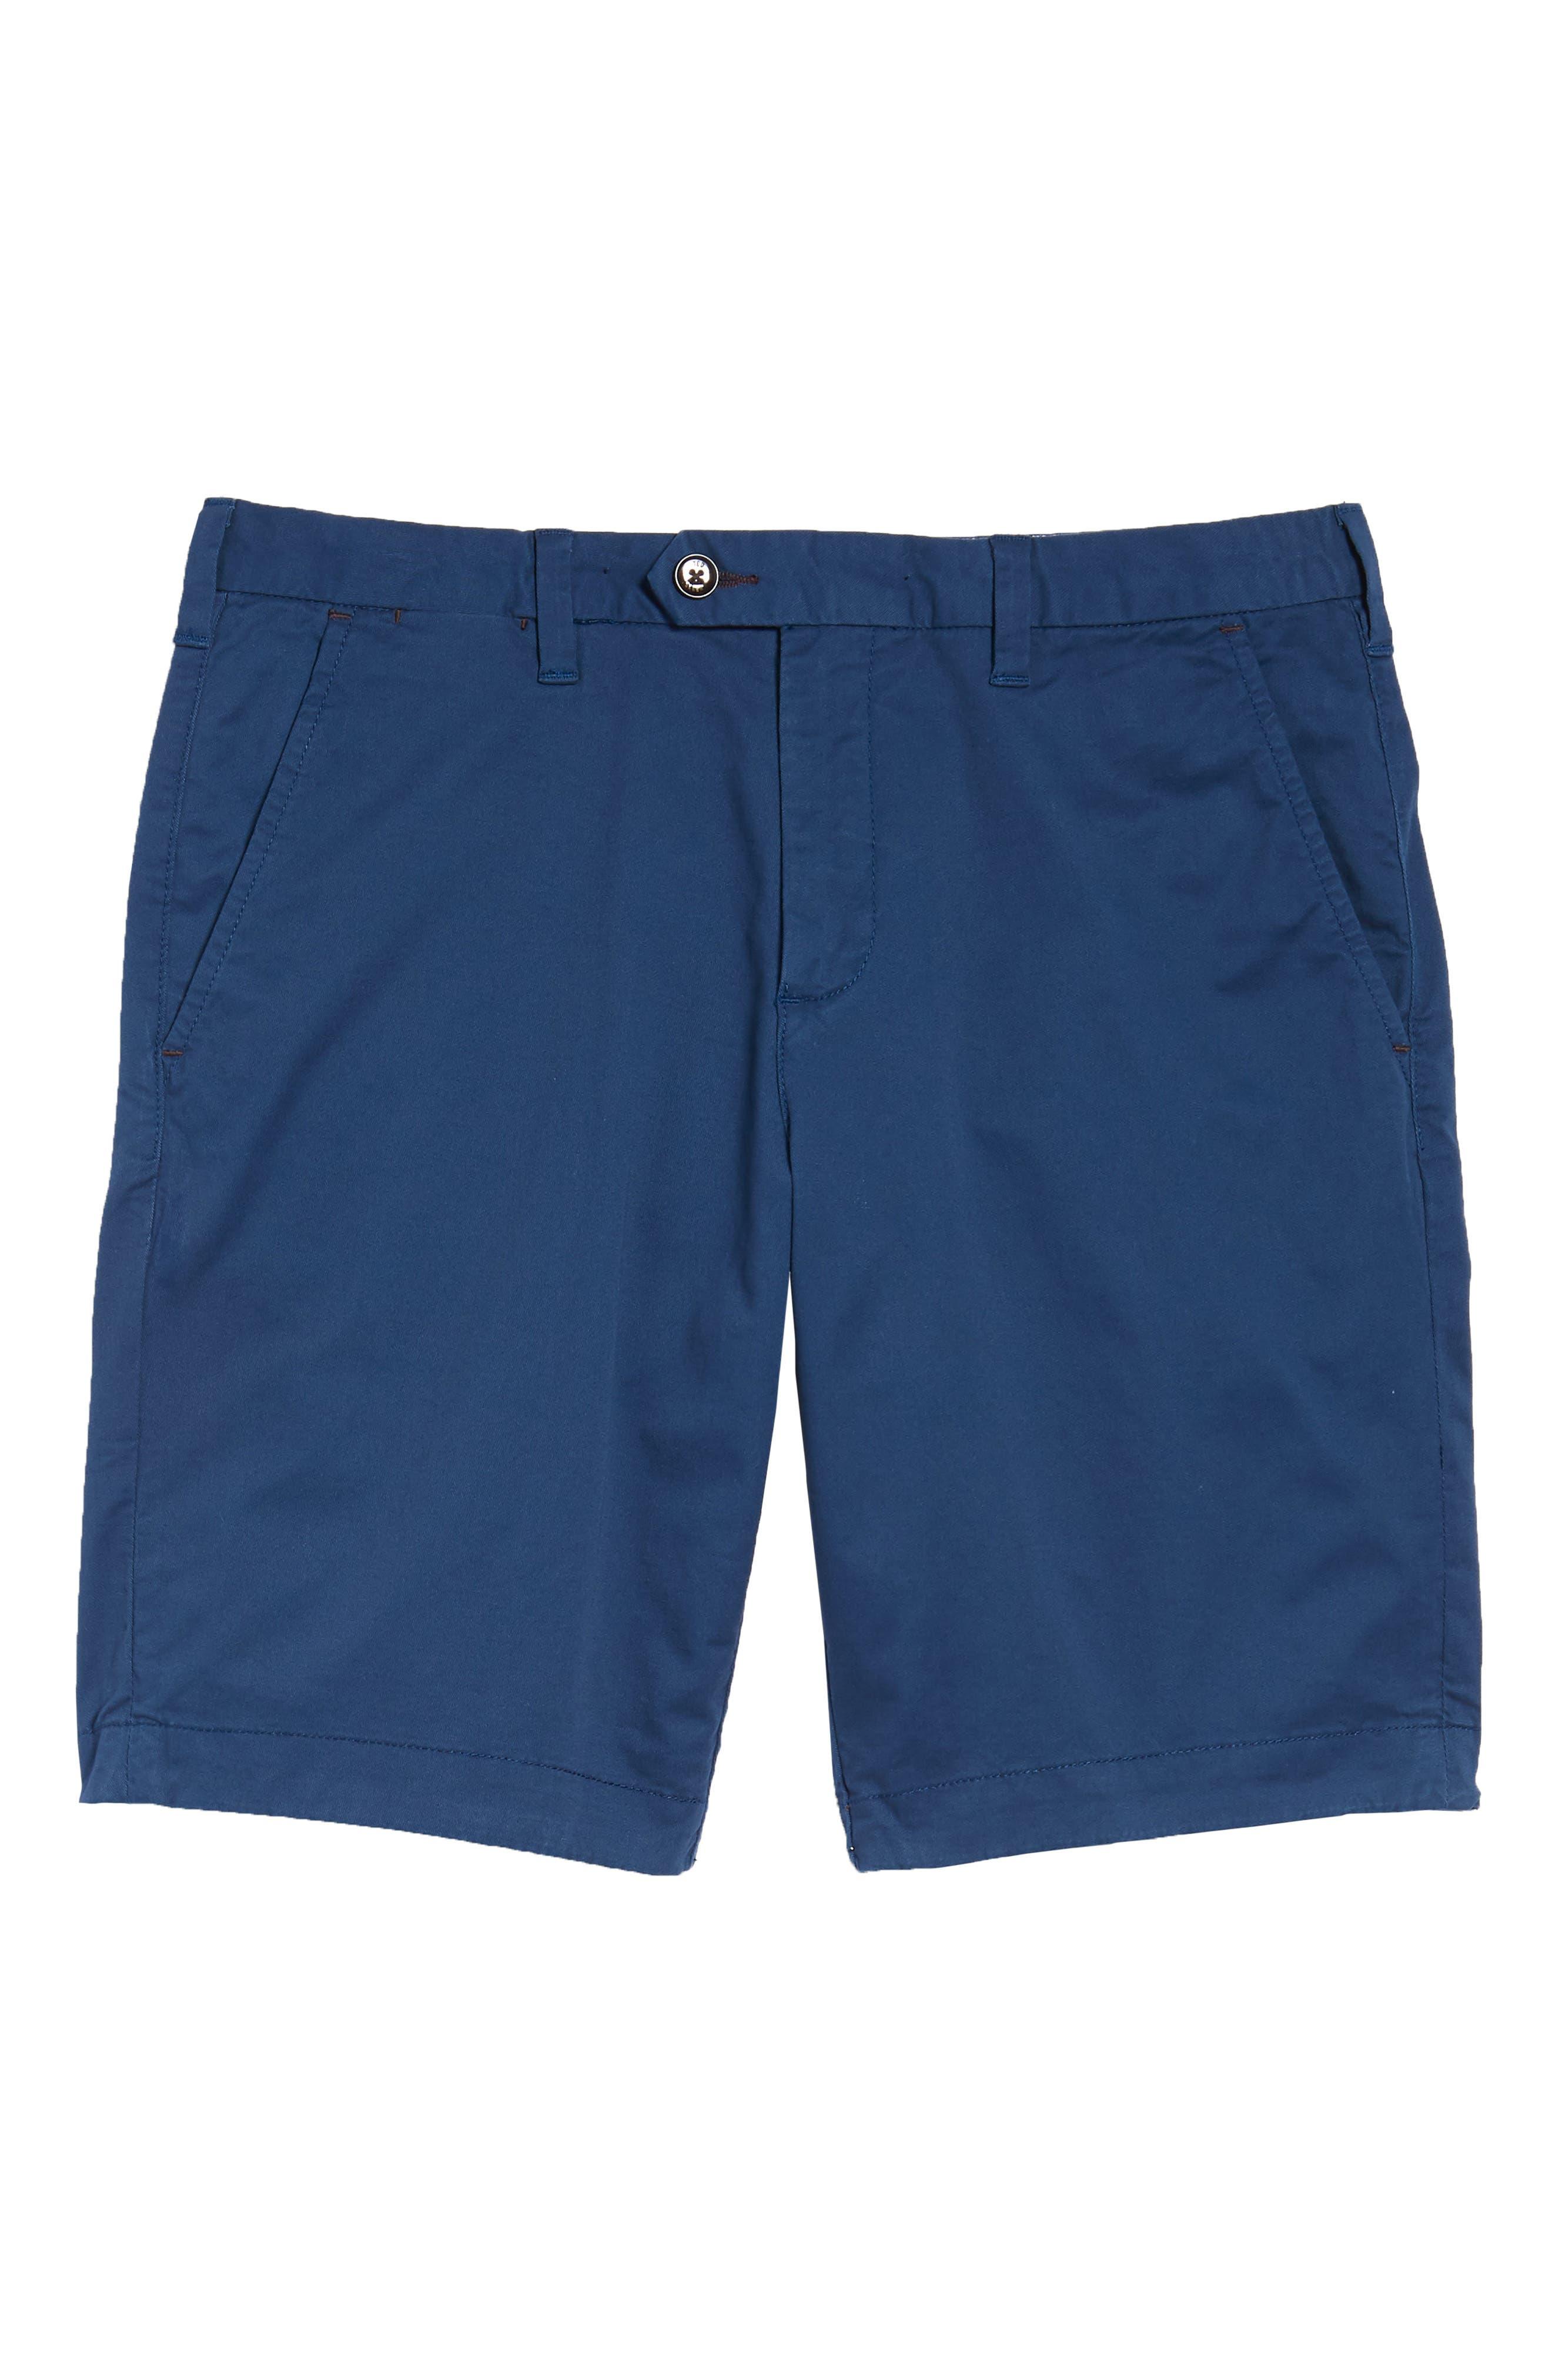 Proshor Slim Fit Chino Shorts,                             Alternate thumbnail 10, color,                             Dark Blue